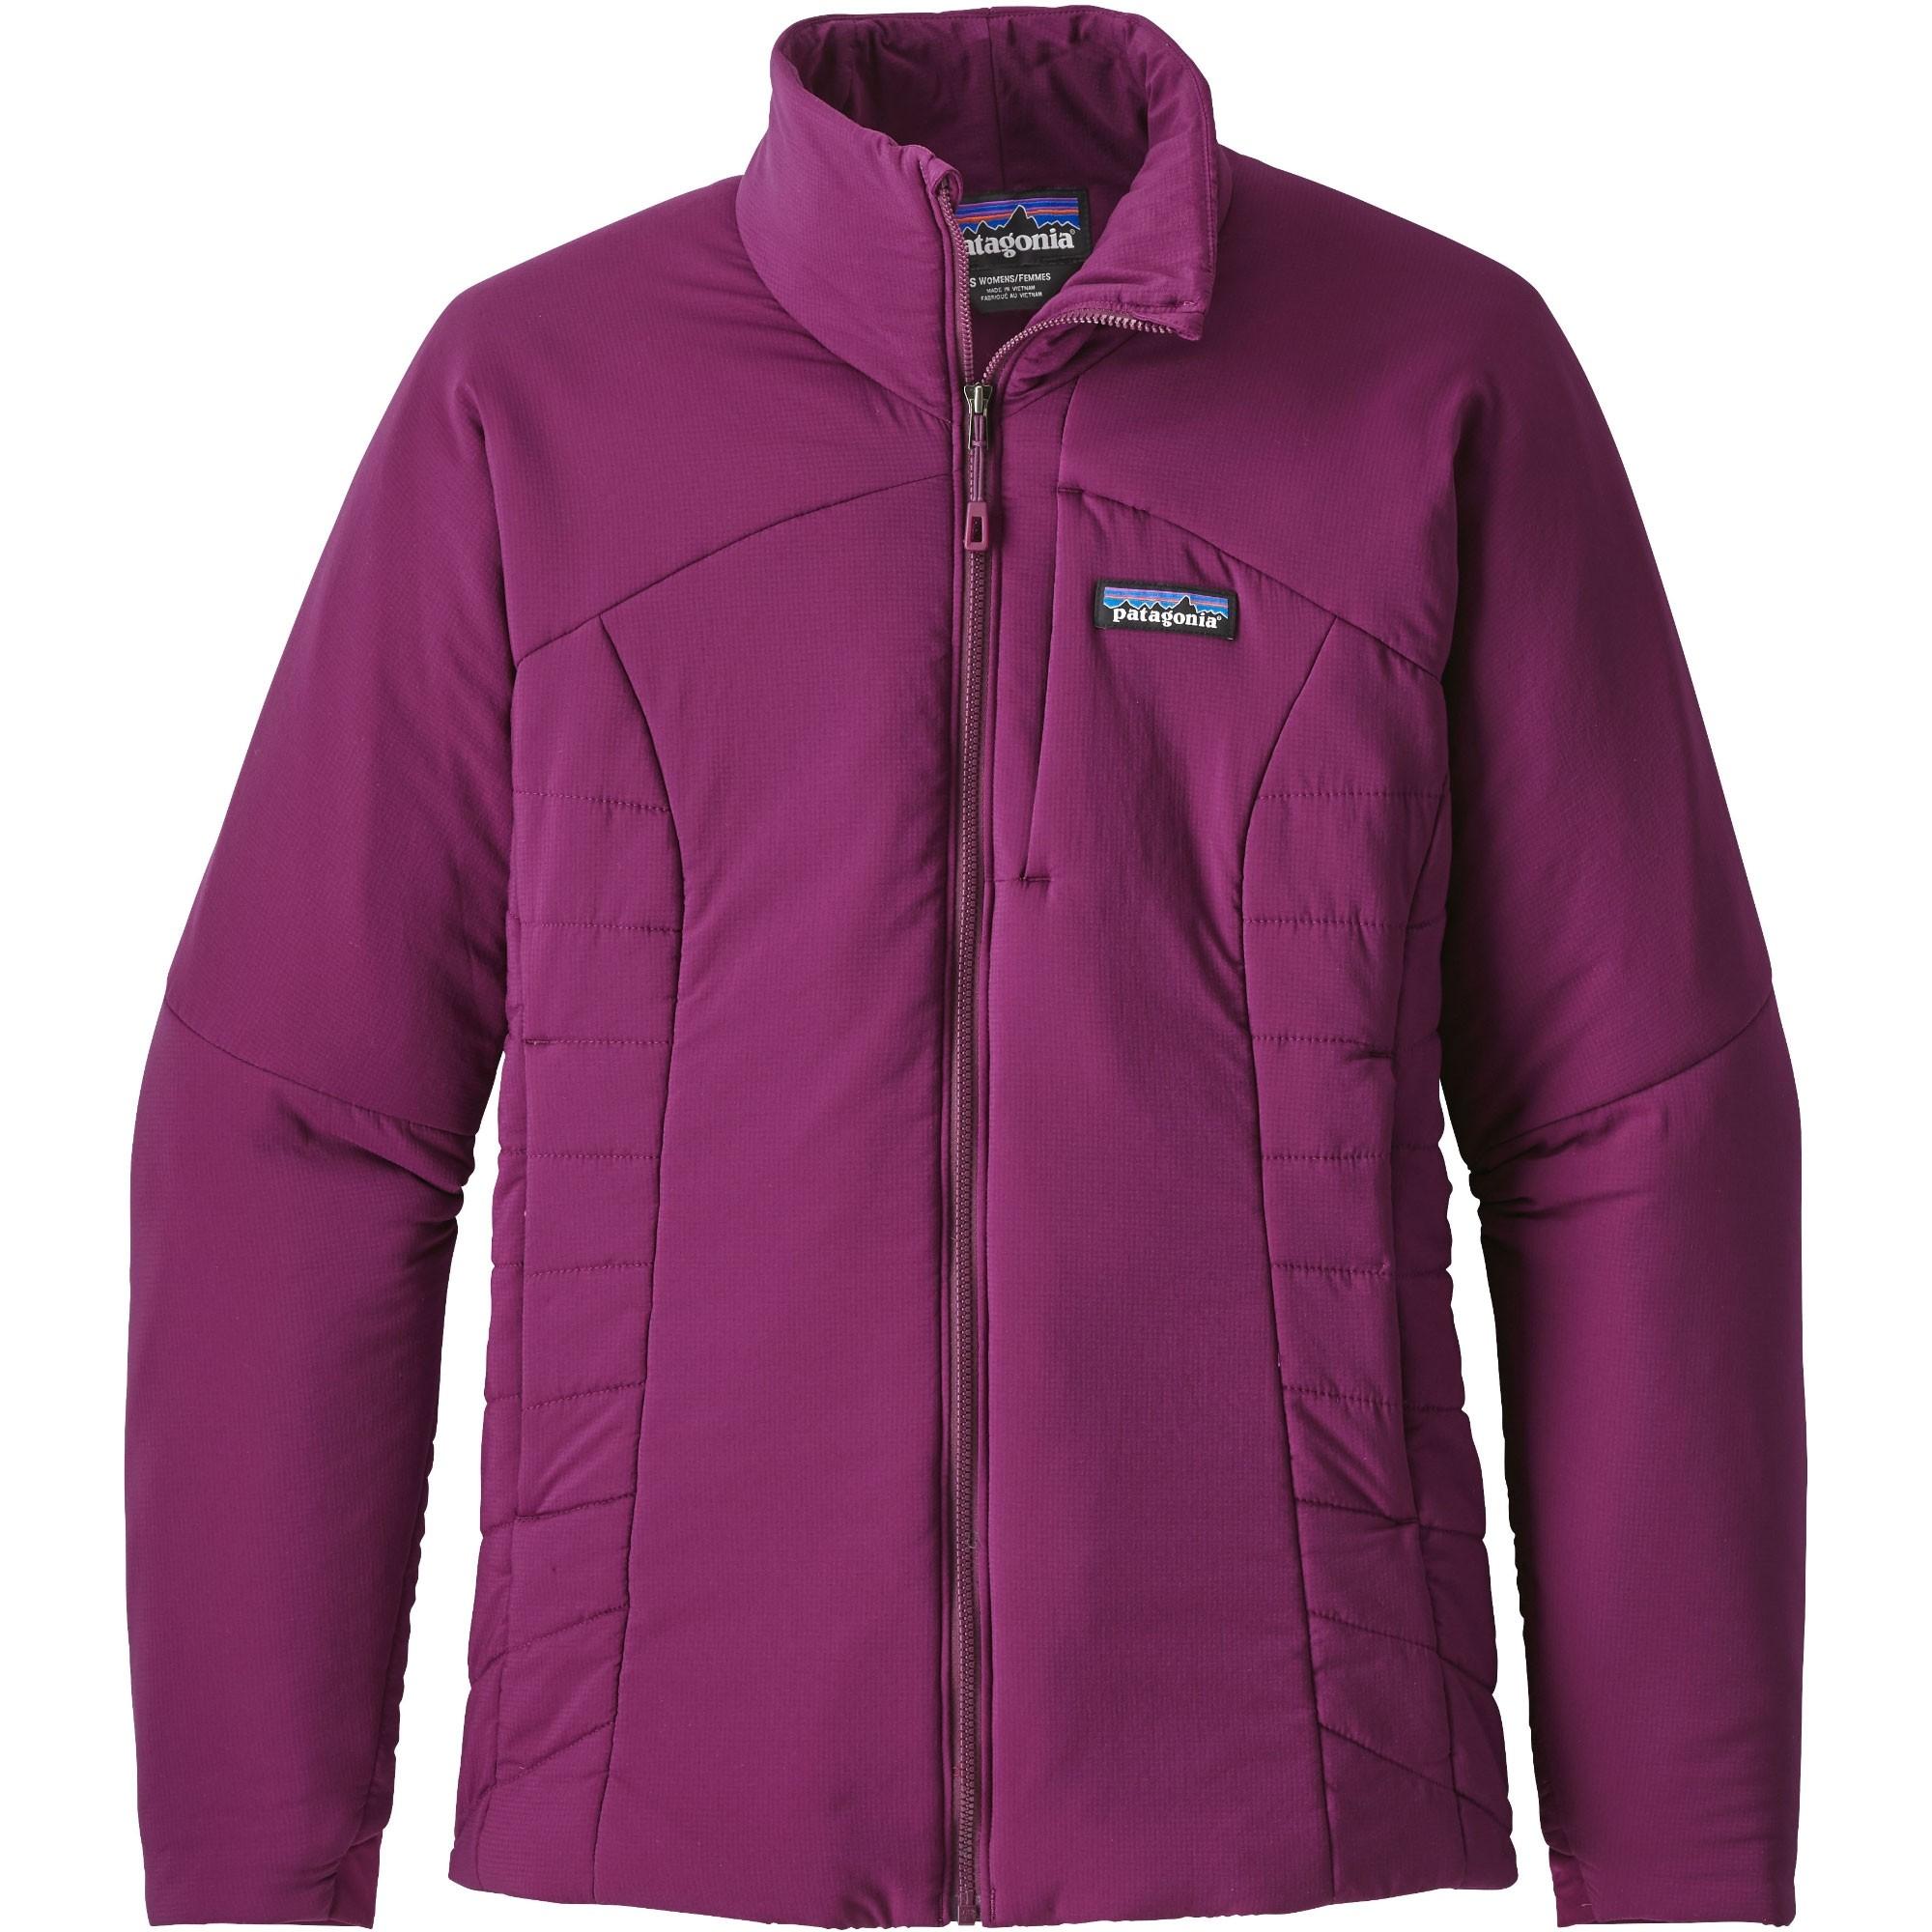 Patagonia Nano-Air Women's Insulated Jacket - Geode Purple